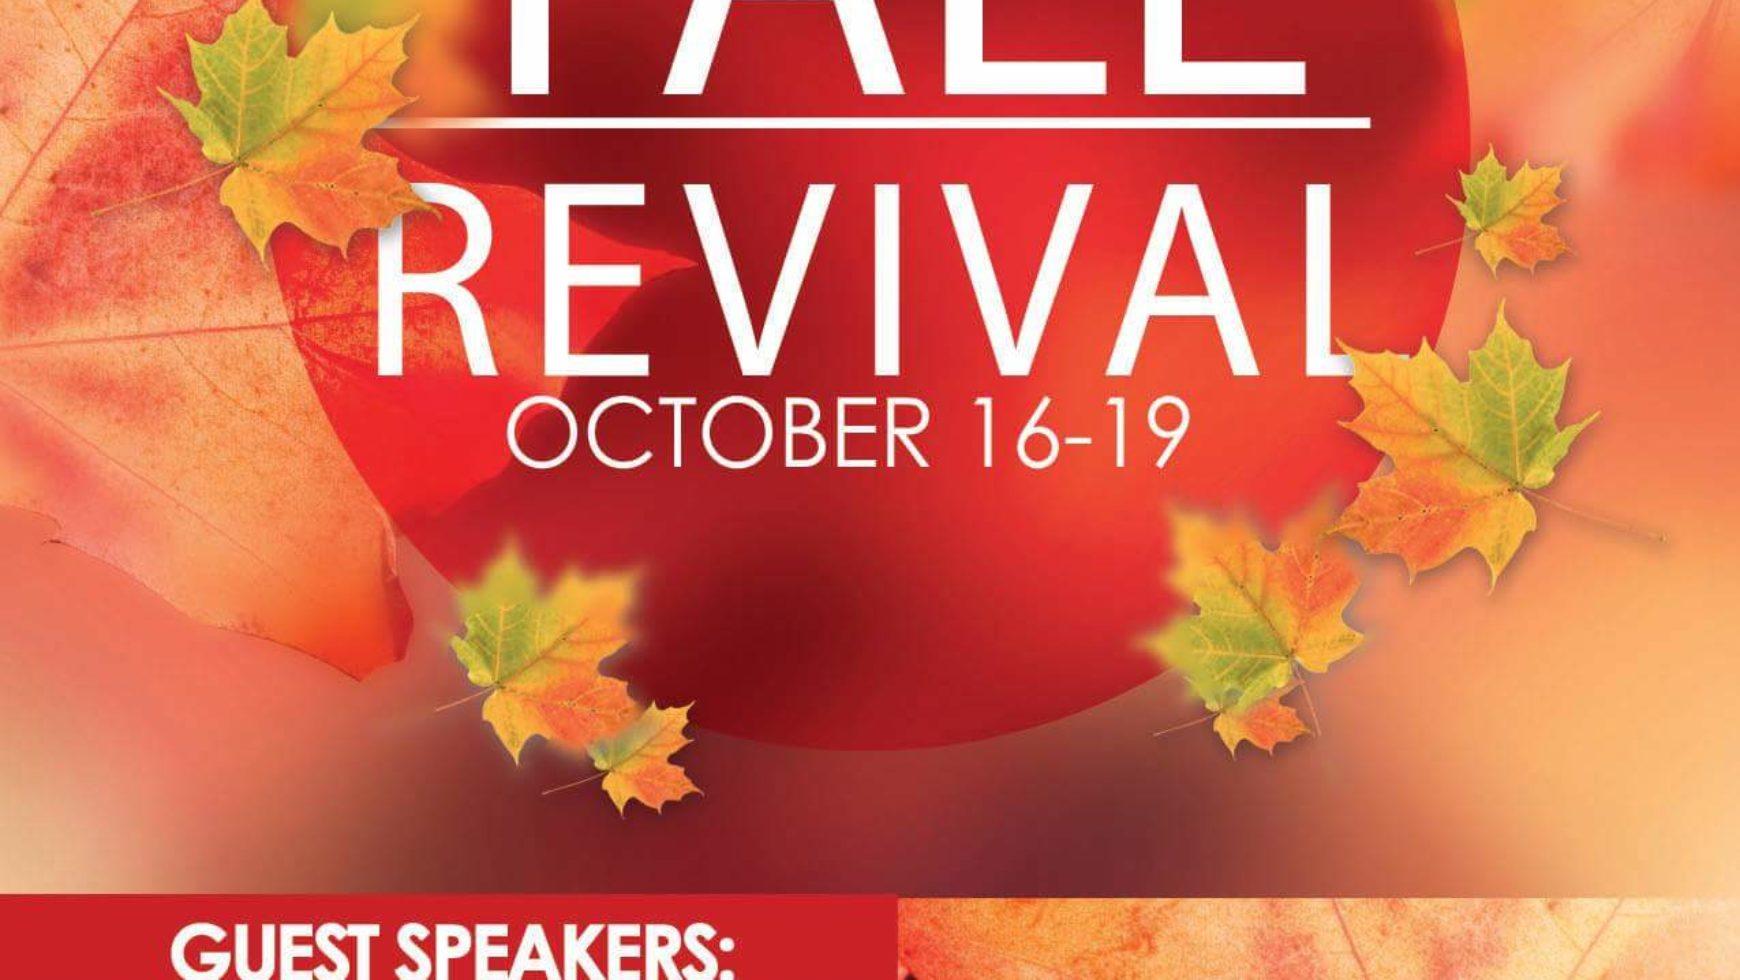 Area Meeting: Revival – Grace Baptist Tabernacle – Chattanooga, TN